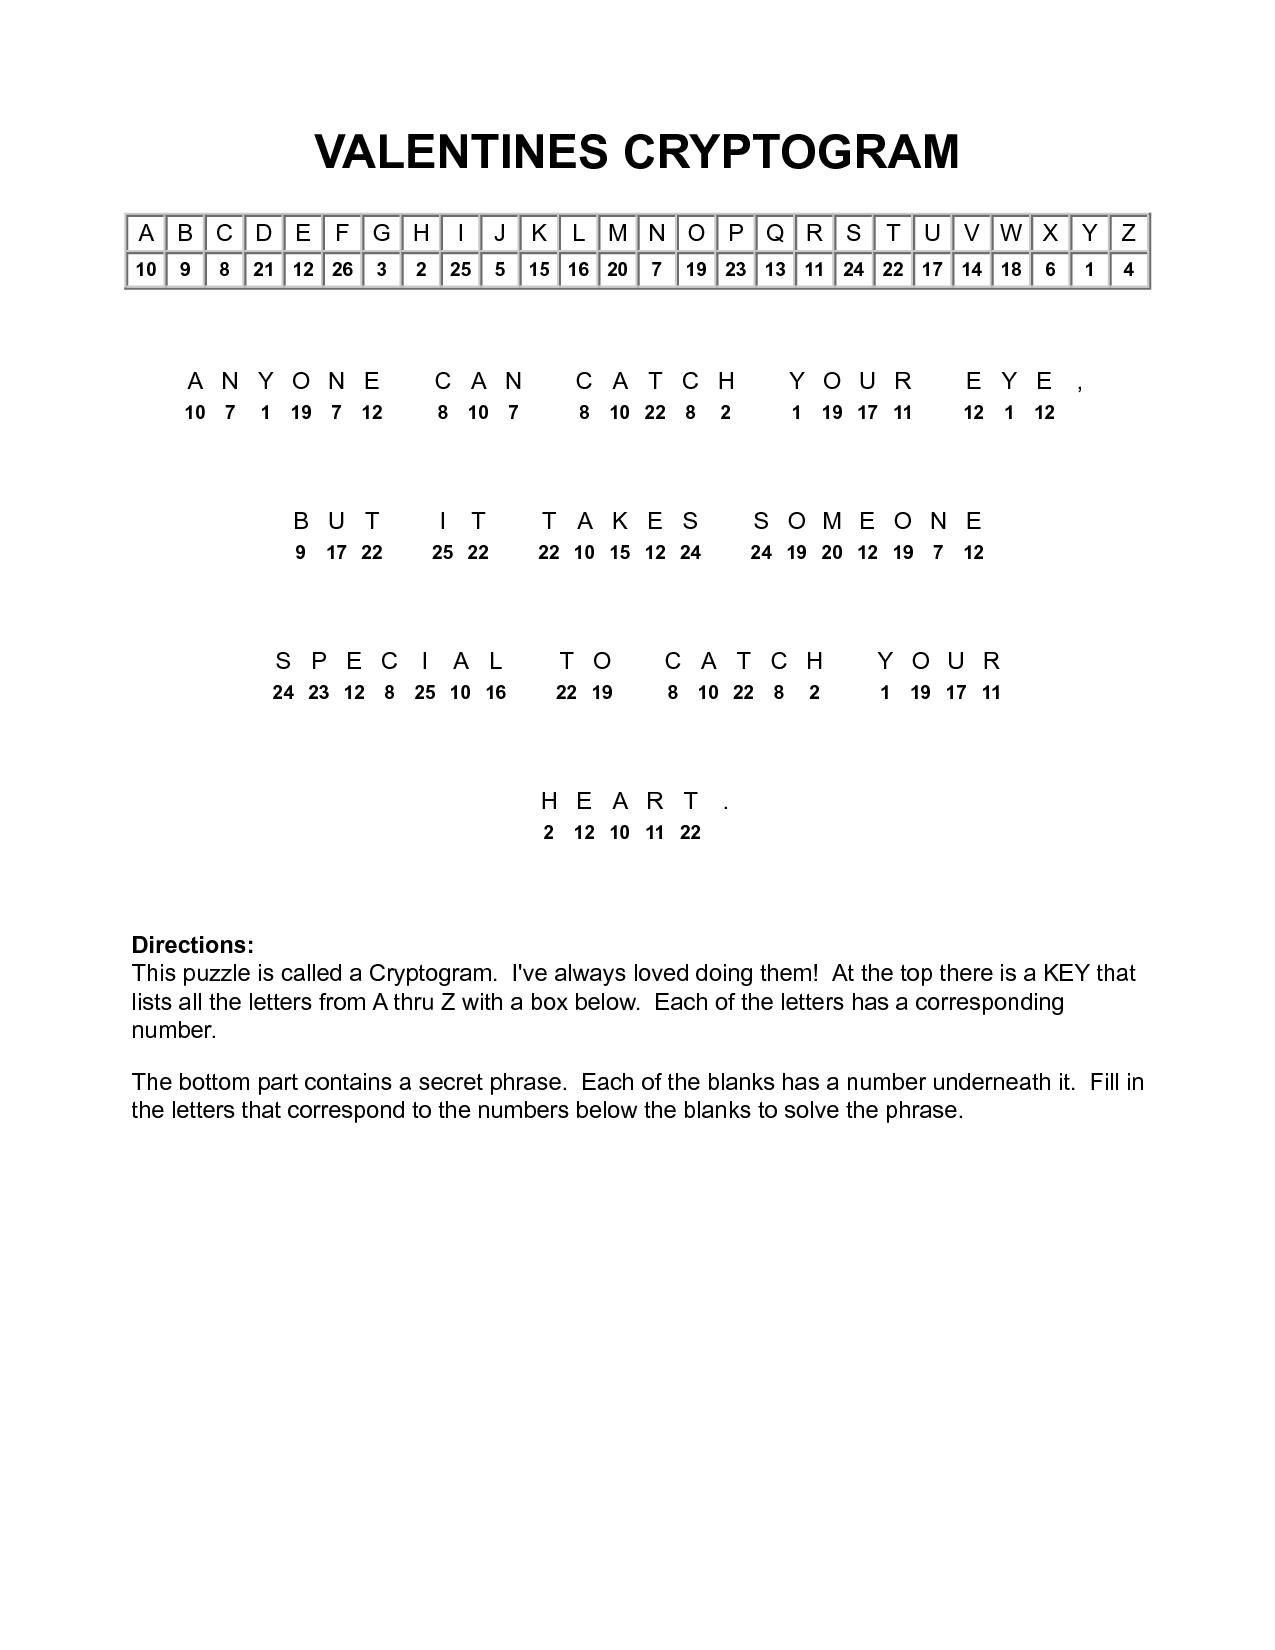 Valentine Cryptograms To Print | Valentines Cryptogram | Puzzles - Free Printable Cryptoquip Puzzles